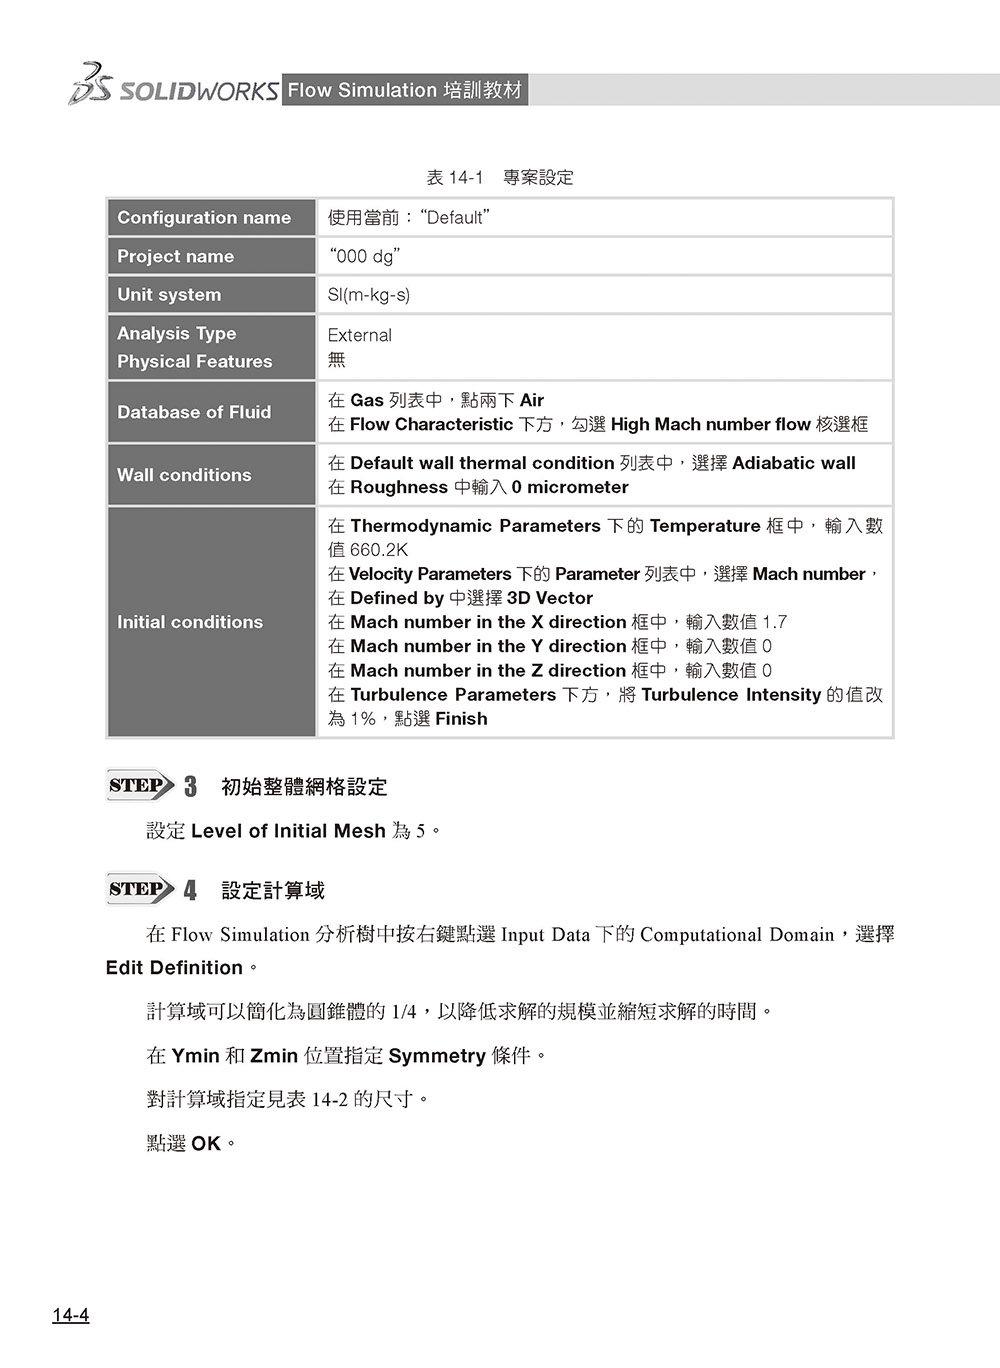 SOLIDWORKS Flow Simulation 培訓教材<繁體中文版>-preview-3